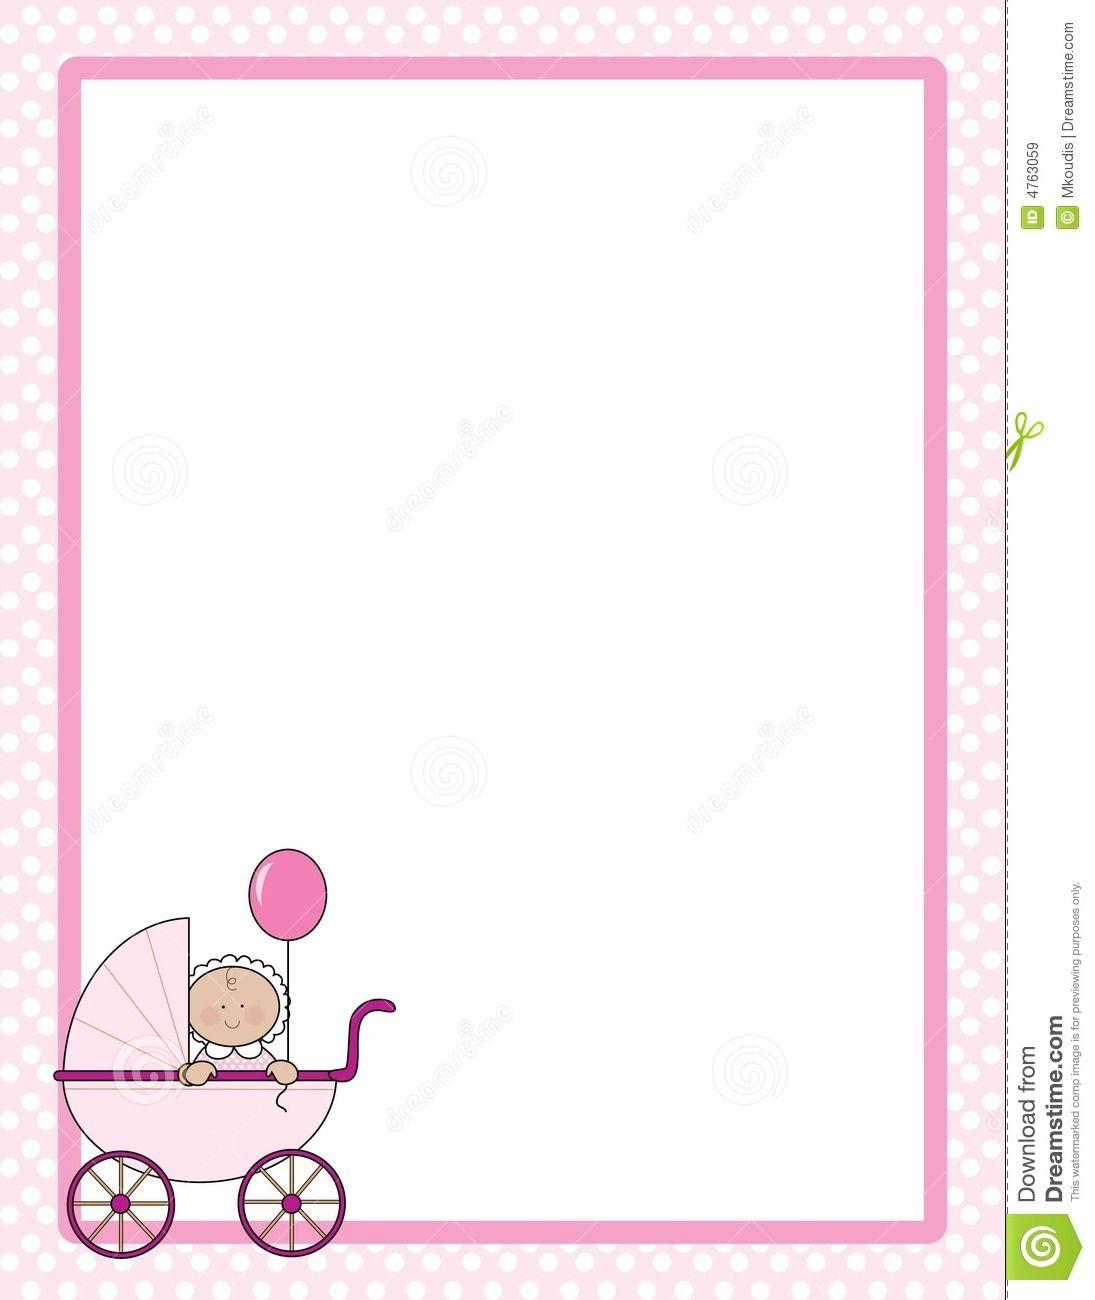 baby border clipart baby shower pinterest rh pinterest com child border clipart cute baby border clipart